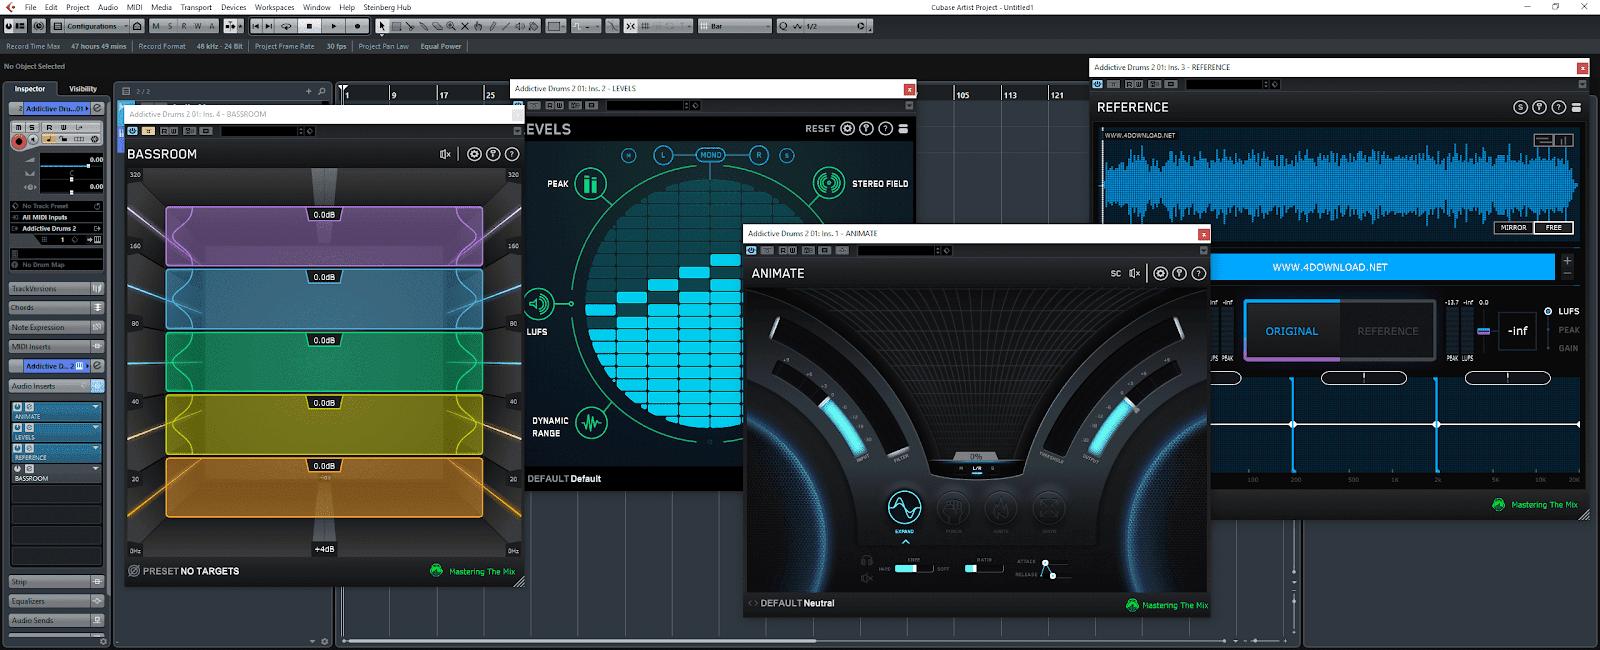 Mastering The Mix Plugin Bundle v2019.6 Full version for free